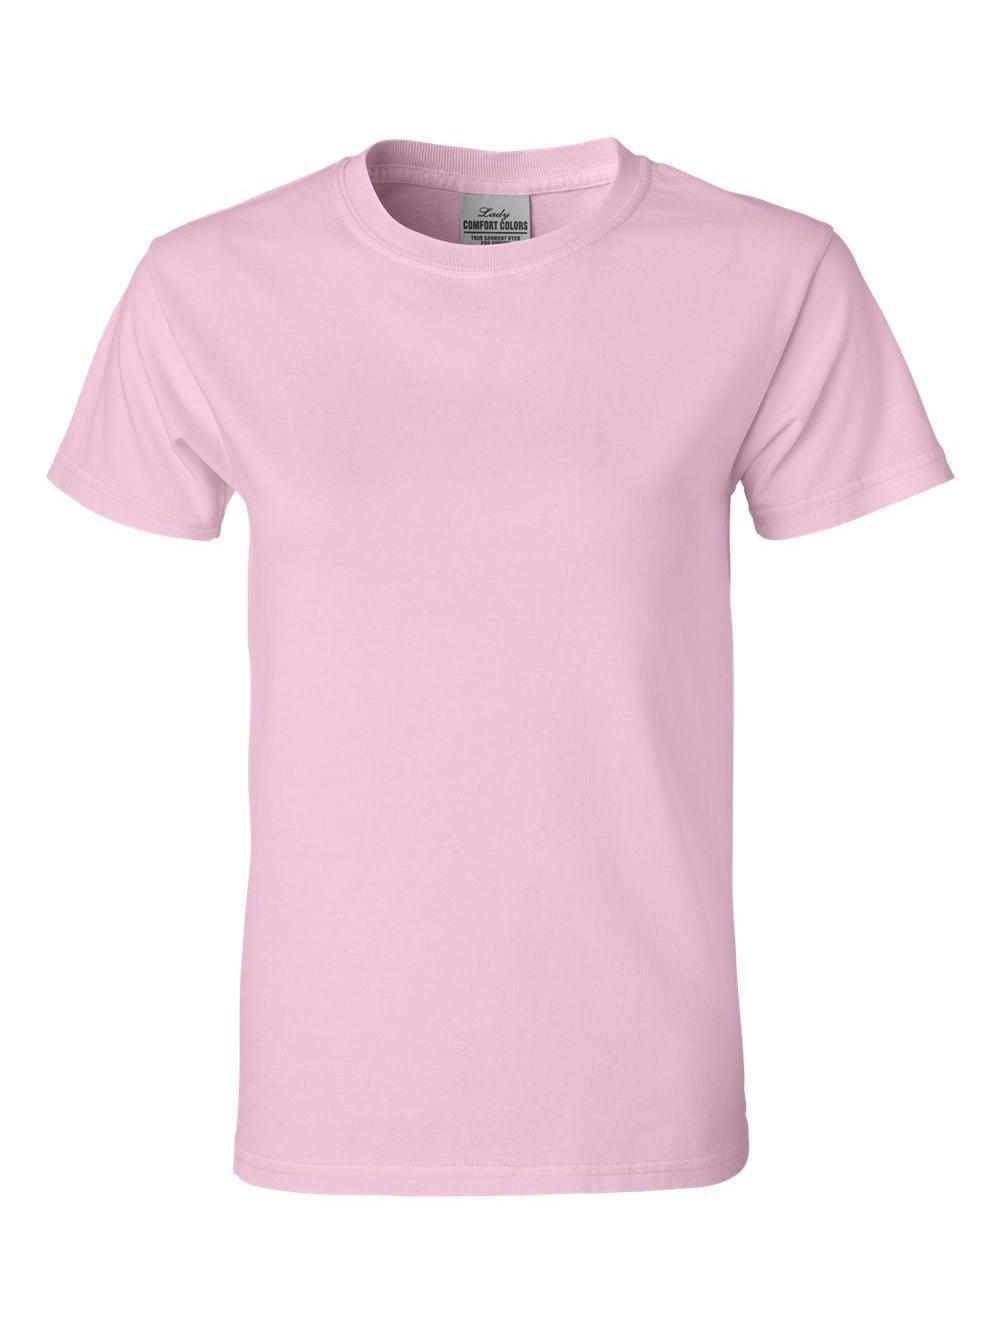 Comfort-Colors-Pigment-Dyed-Ringspun-Women-039-s-Short-Sleeve-T-Shirt-3333 thumbnail 3